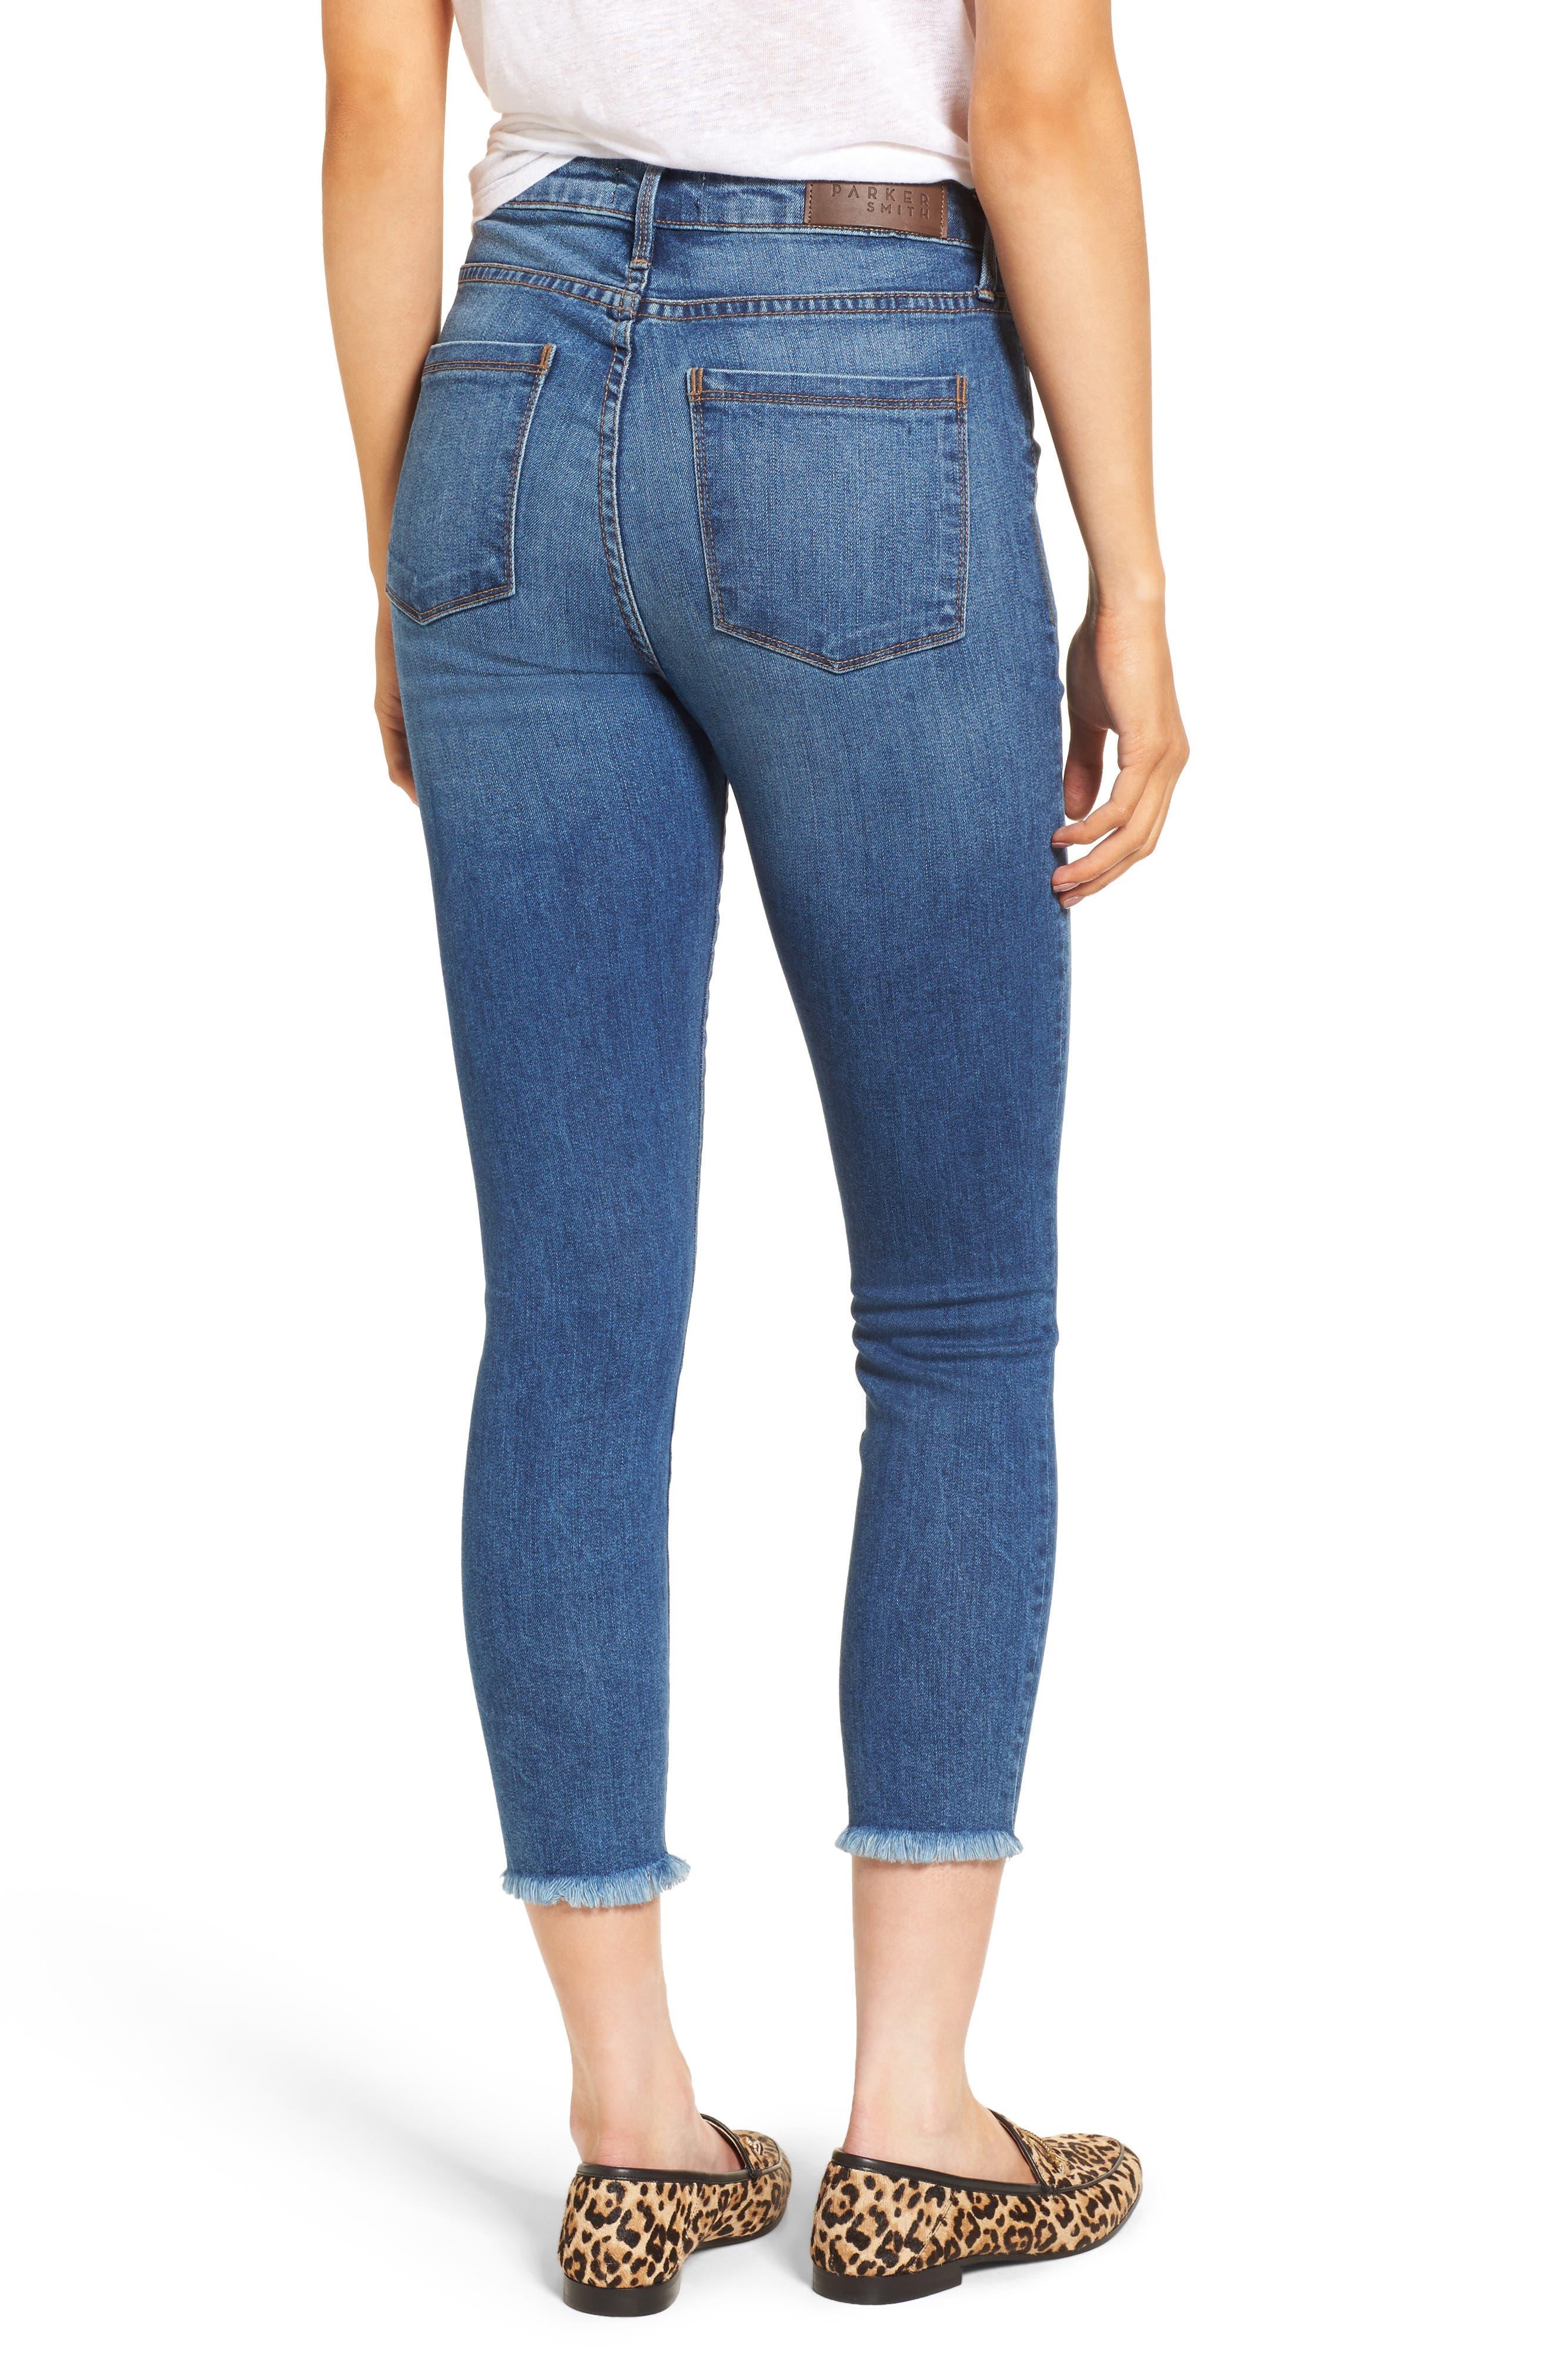 Bombshell Raw Hem Stretch Skinny Jeans,                             Alternate thumbnail 2, color,                             Dawn